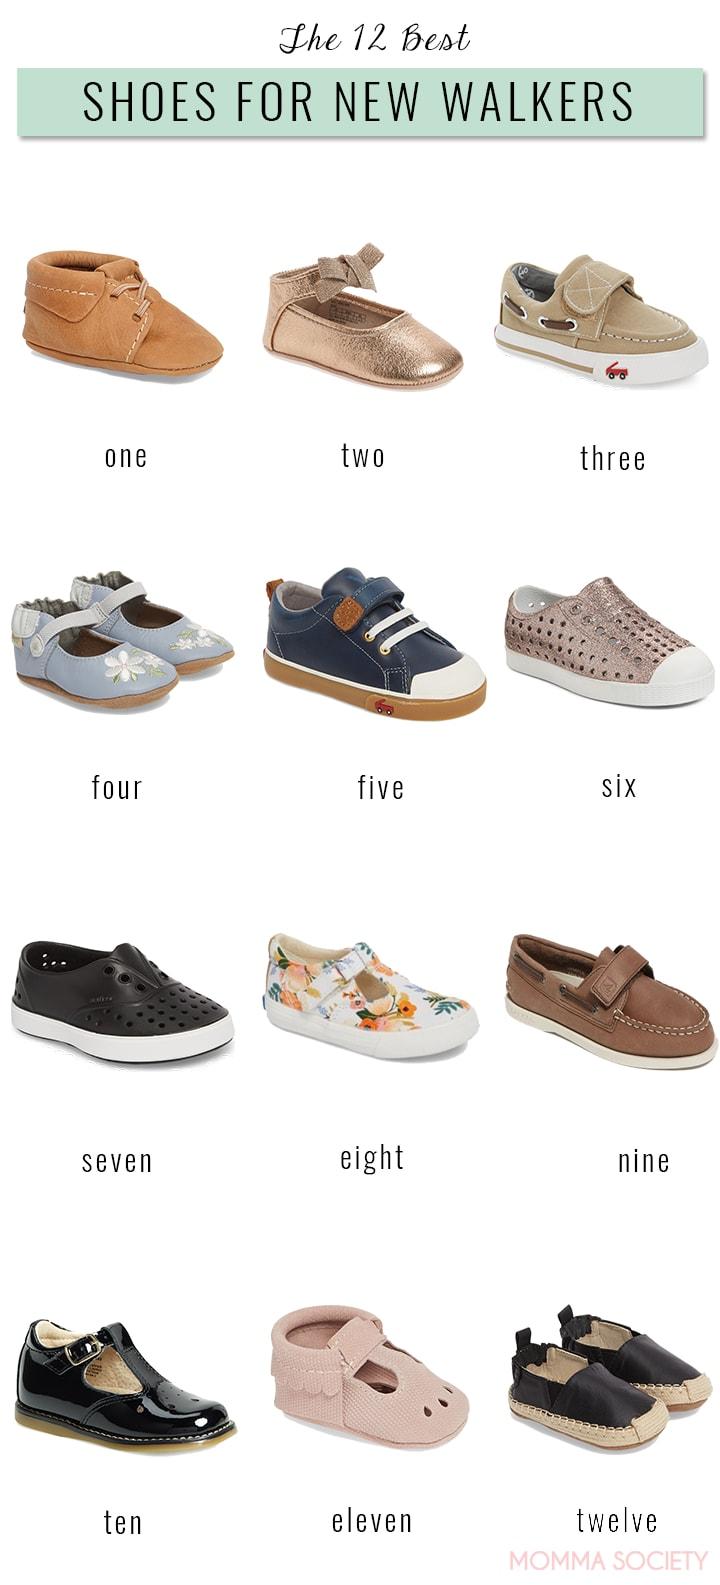 The Best Baby Walking Shoes.jpg